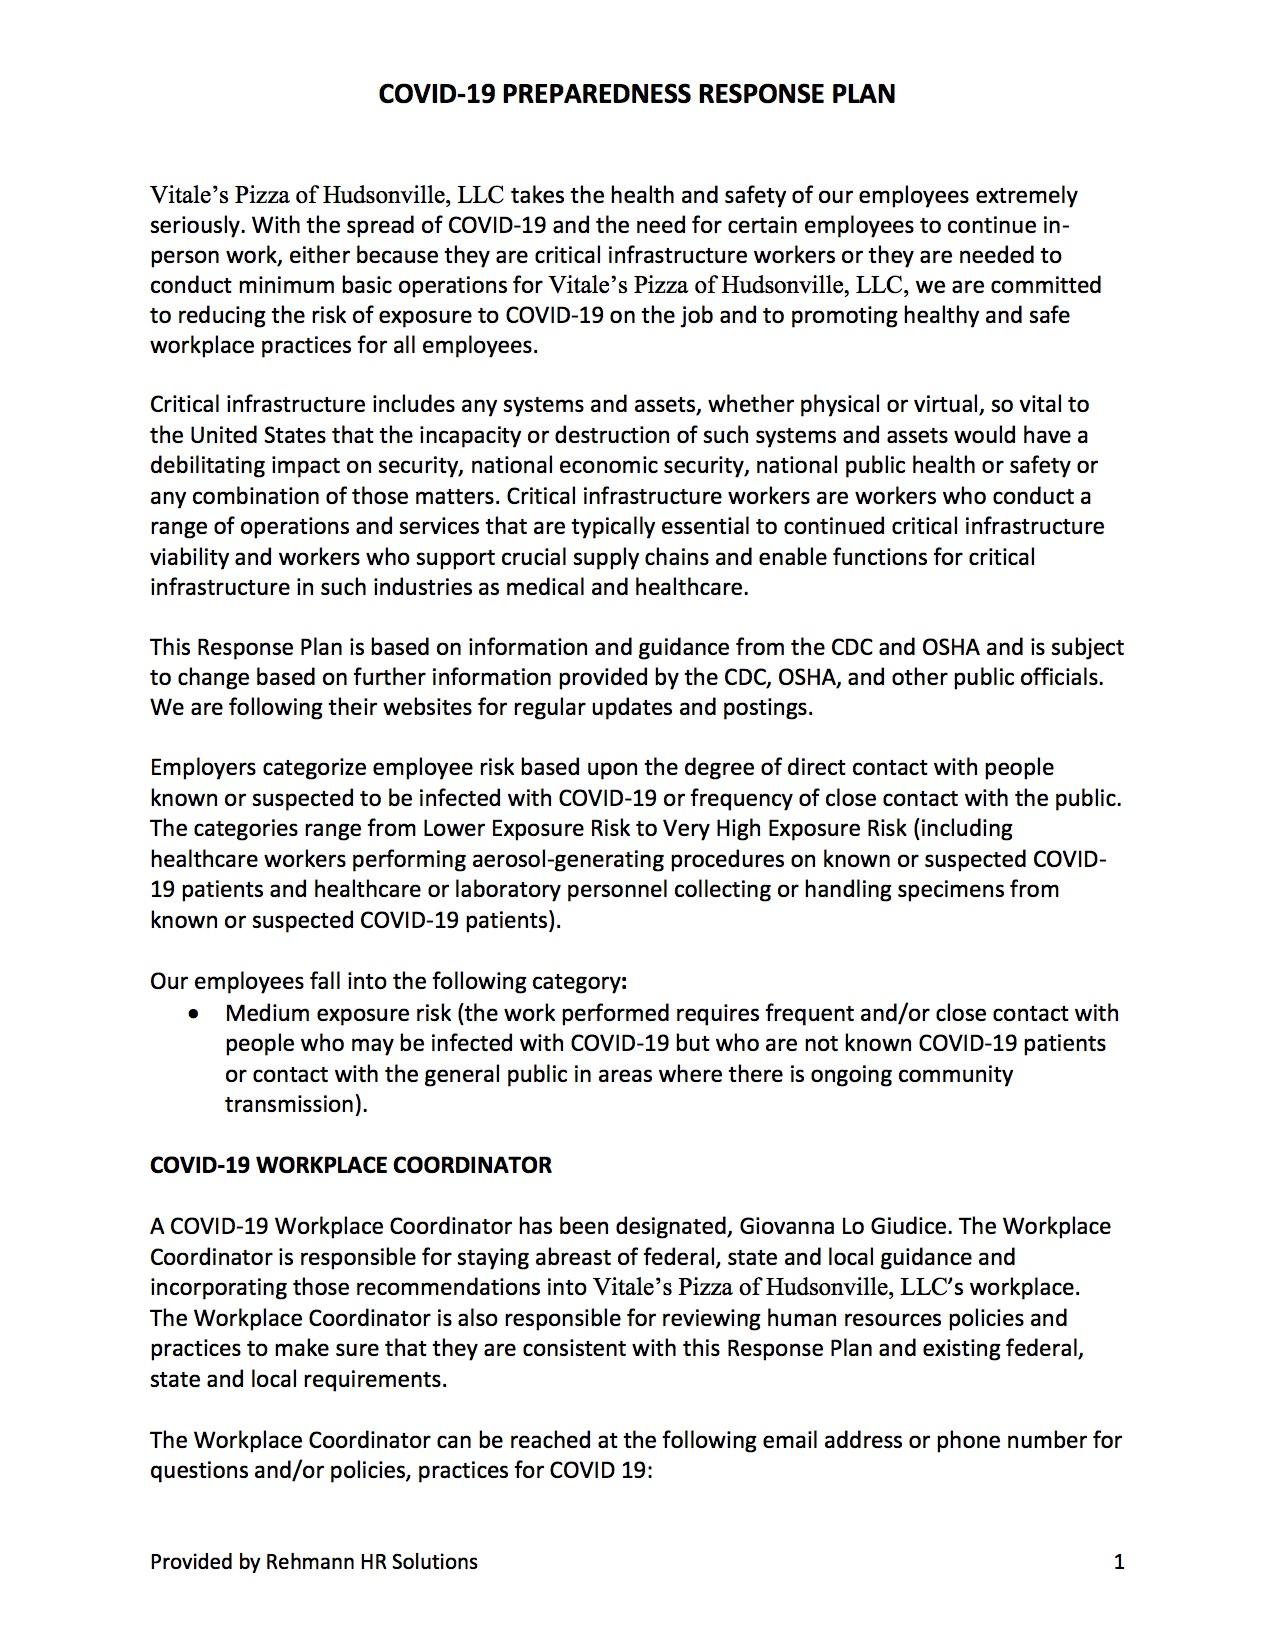 Summary - COVID-19 Preparedness Response Plan